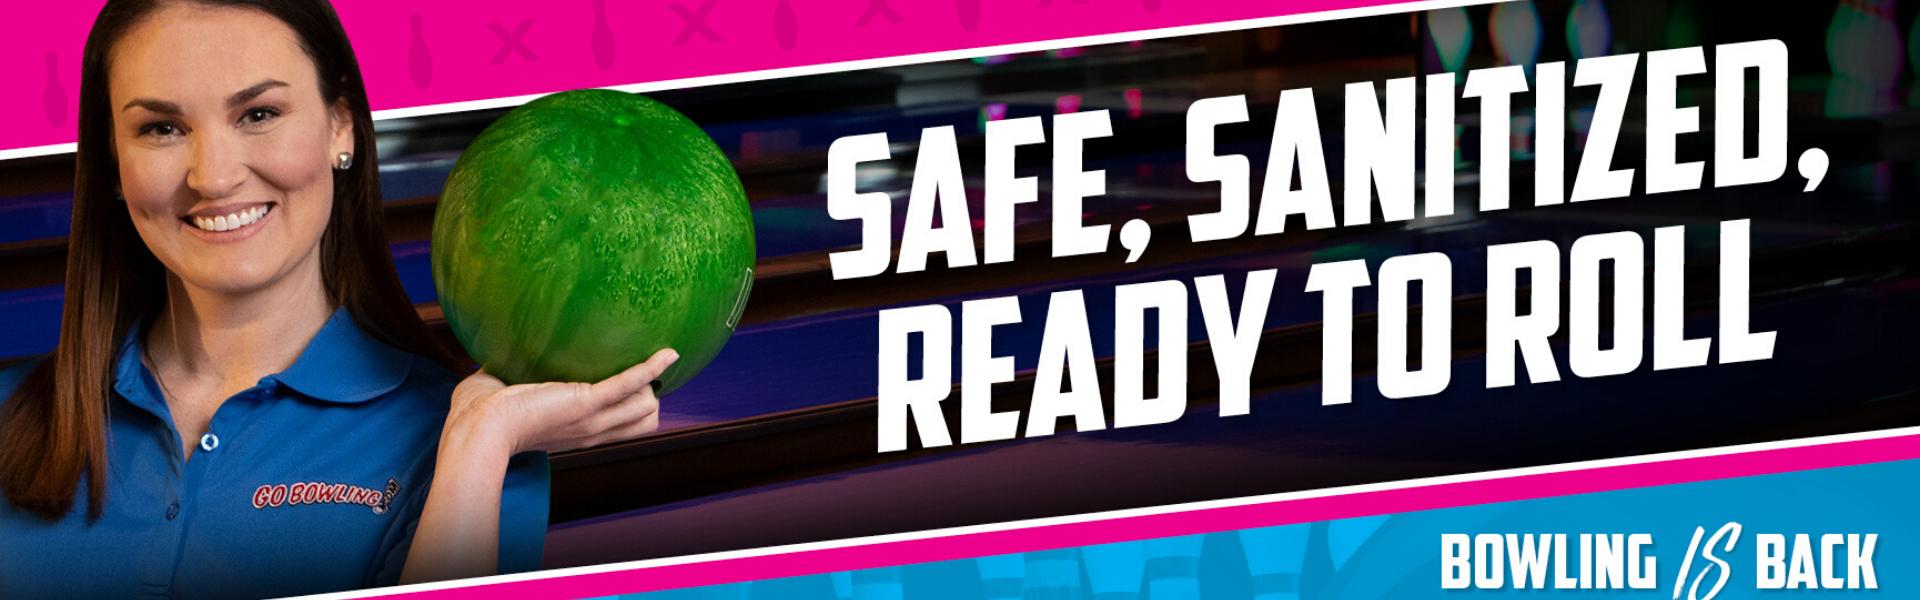 Safe and sanitized | Odyssey Fun Center | Sheboygan WI